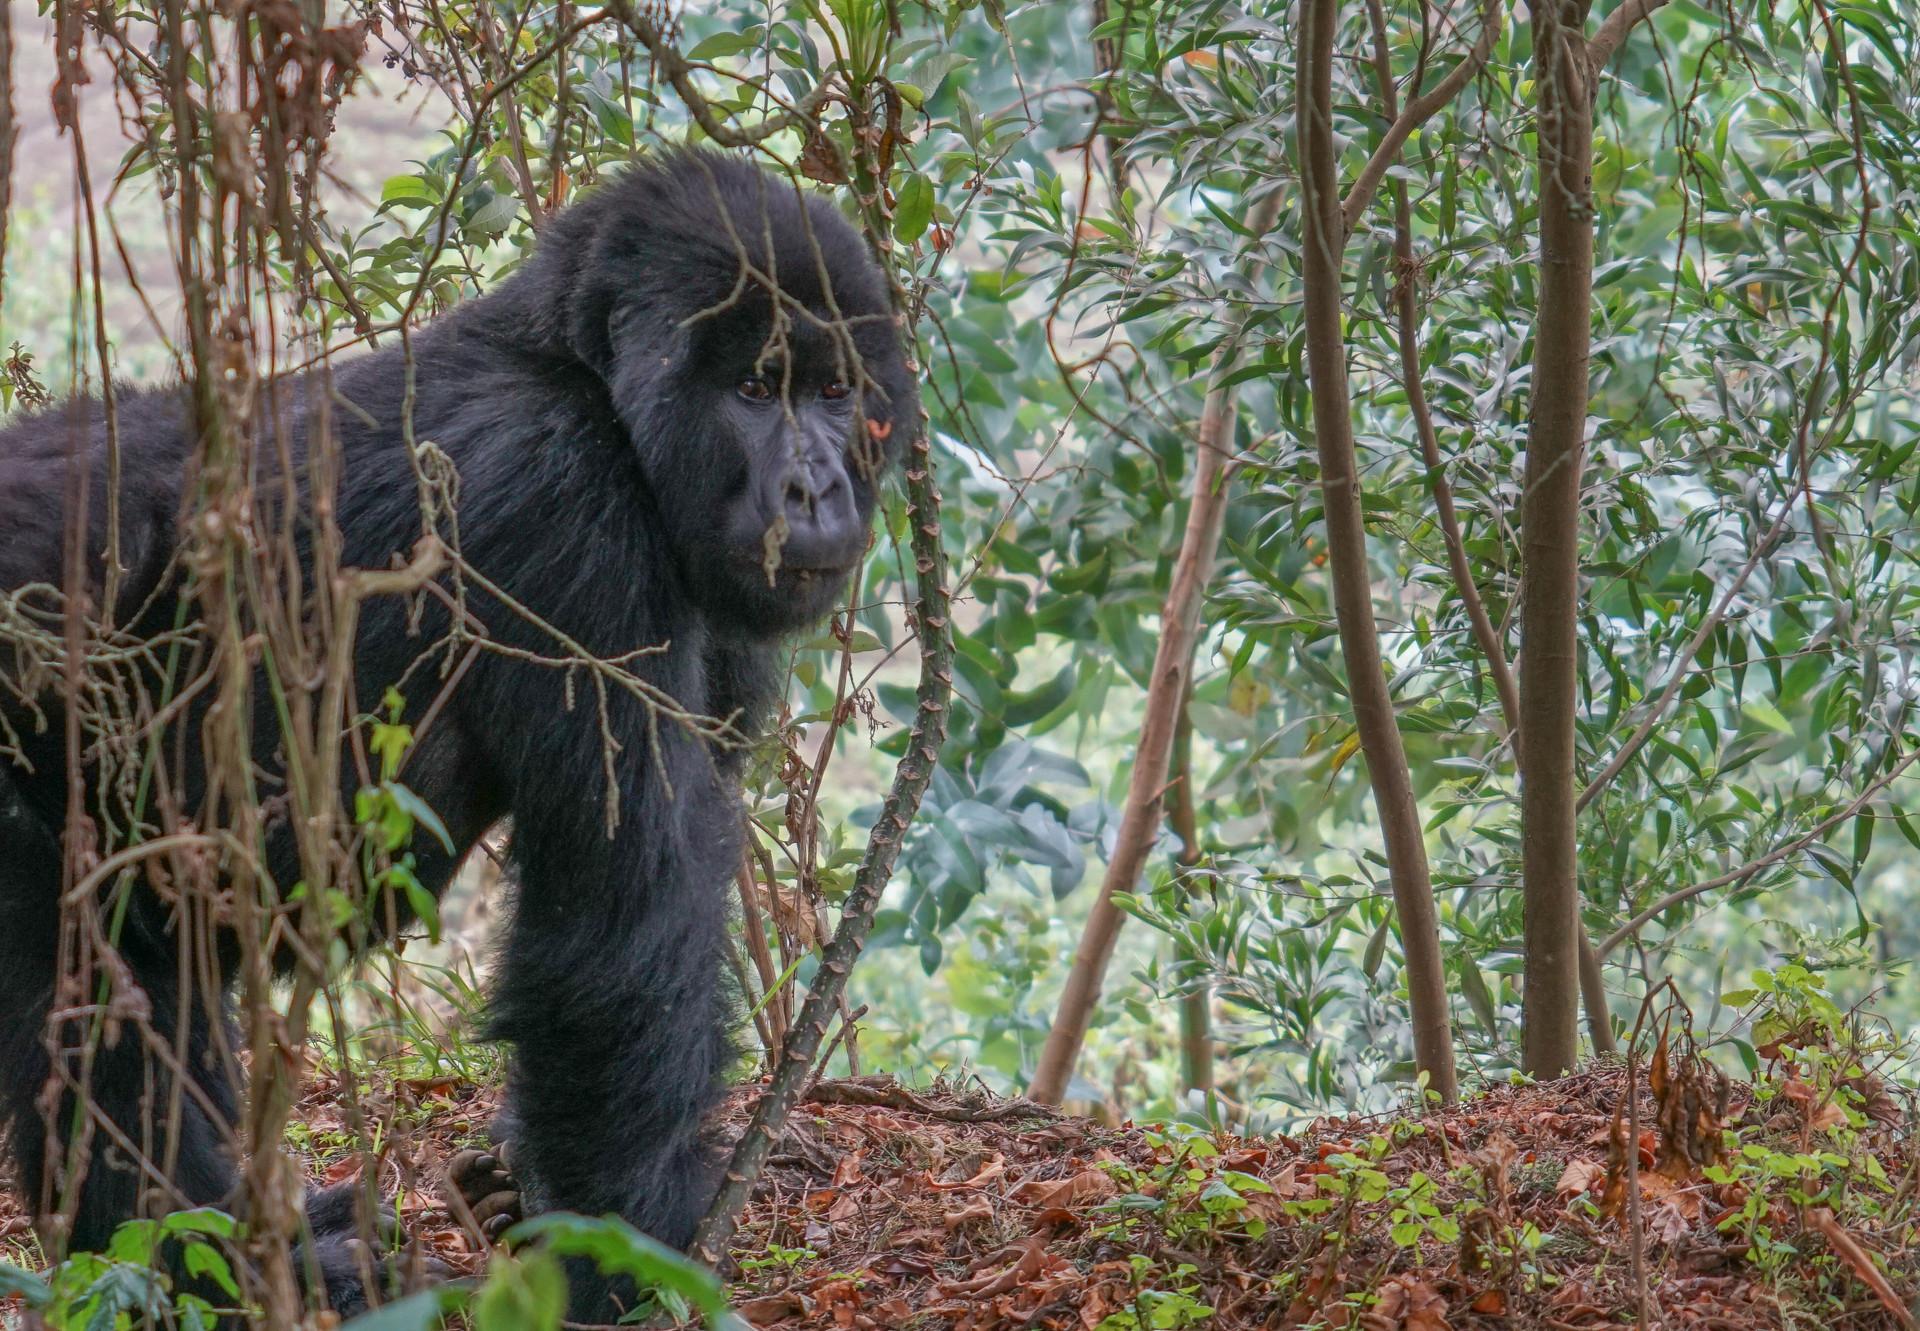 Gorilla Connection